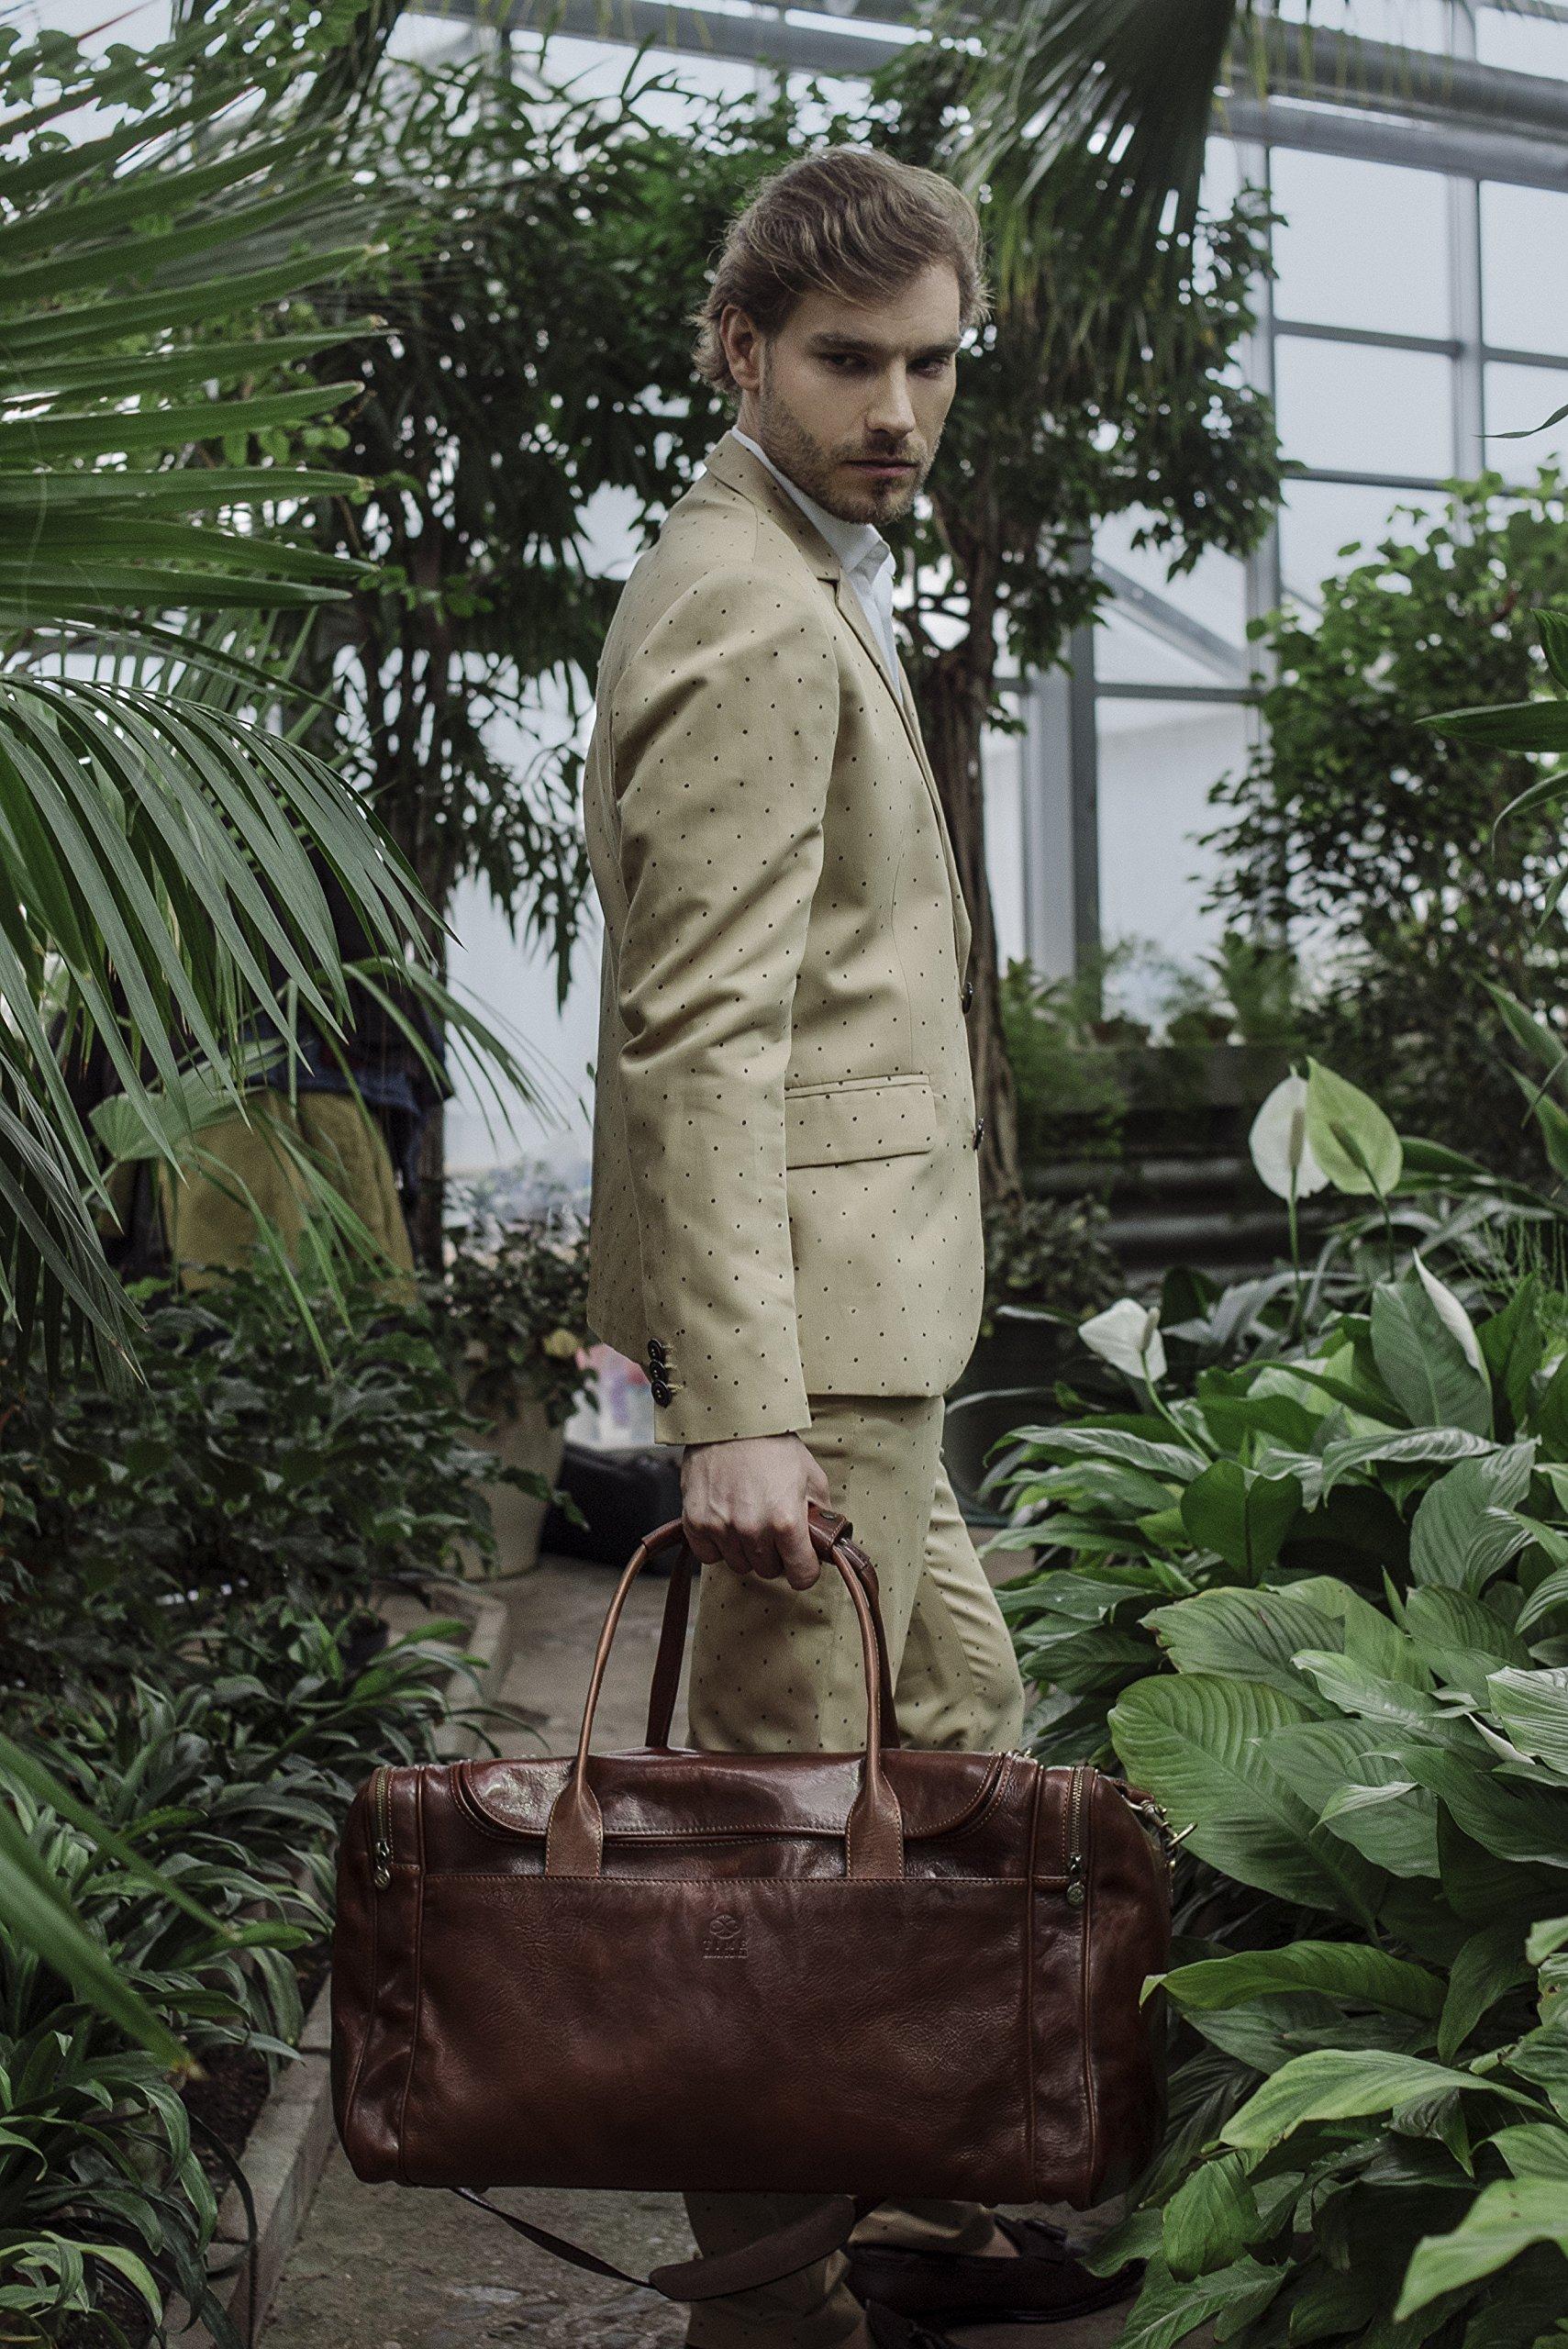 Leather Duffel Bag, Weekend Bag, Gym, Large Travel Bag, Cognac, Brown - Time Resistance by Time Resistance (Image #9)